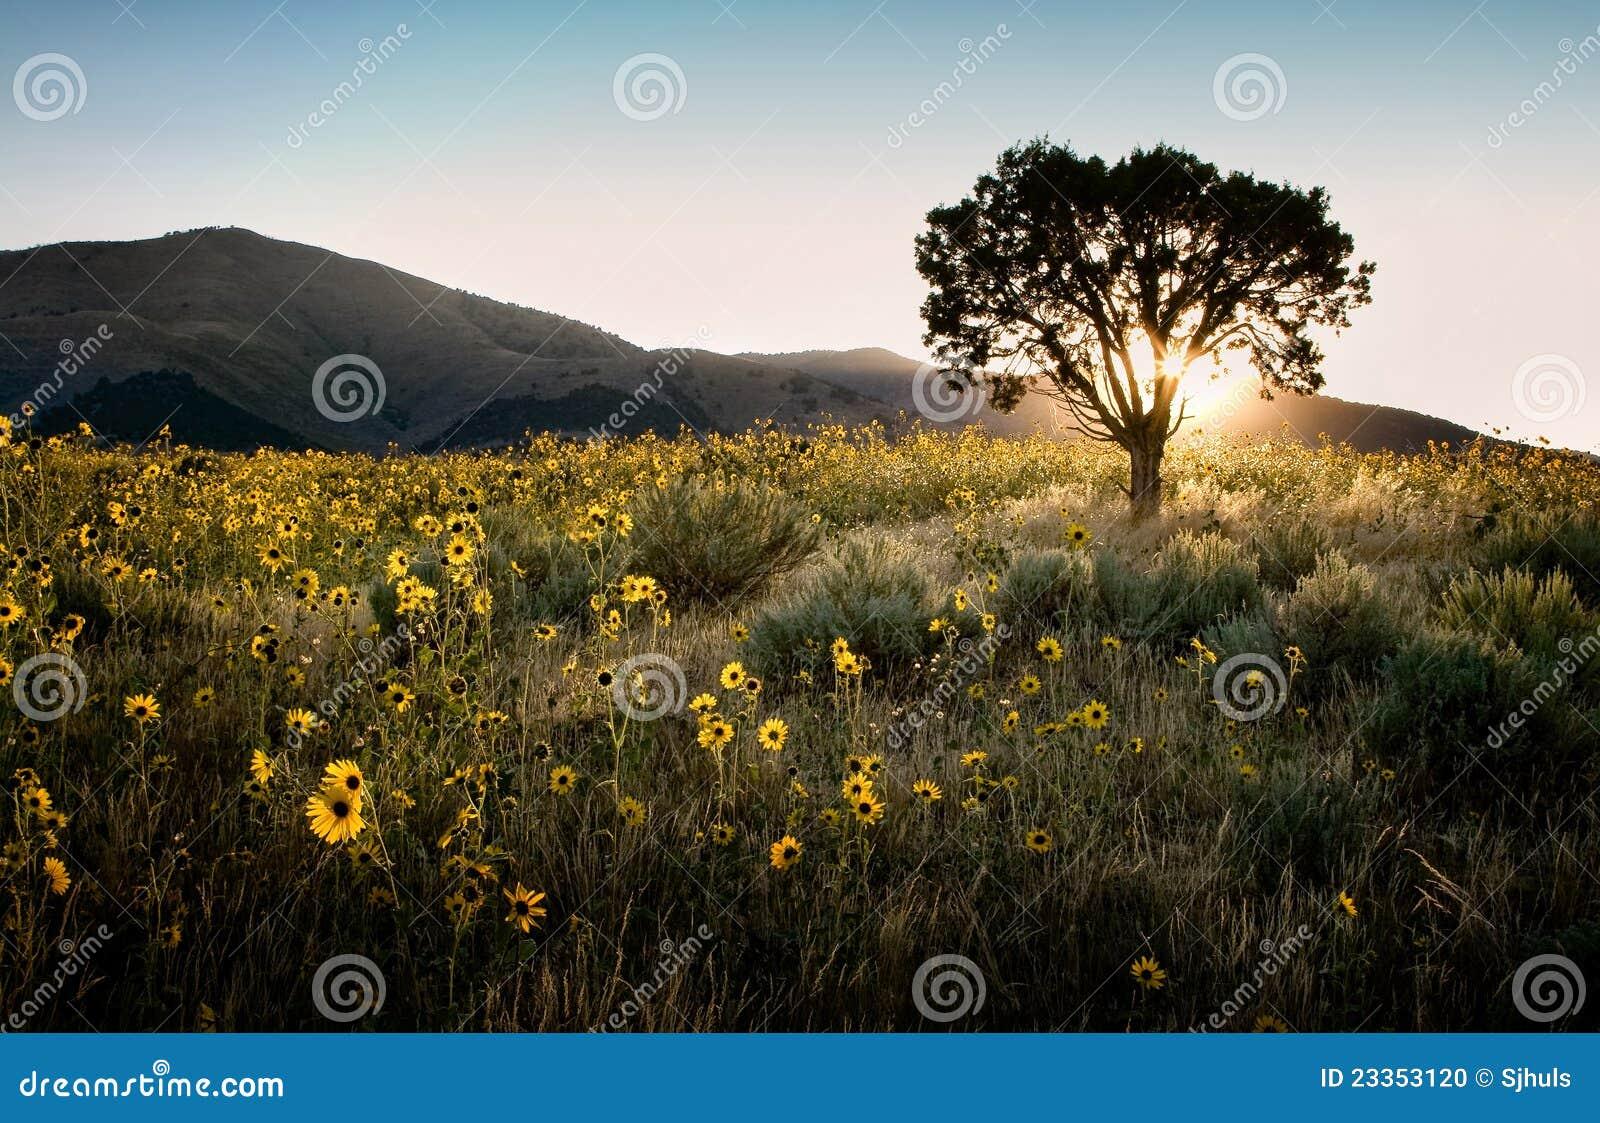 Sun shining through a juniper tree with sunflowers